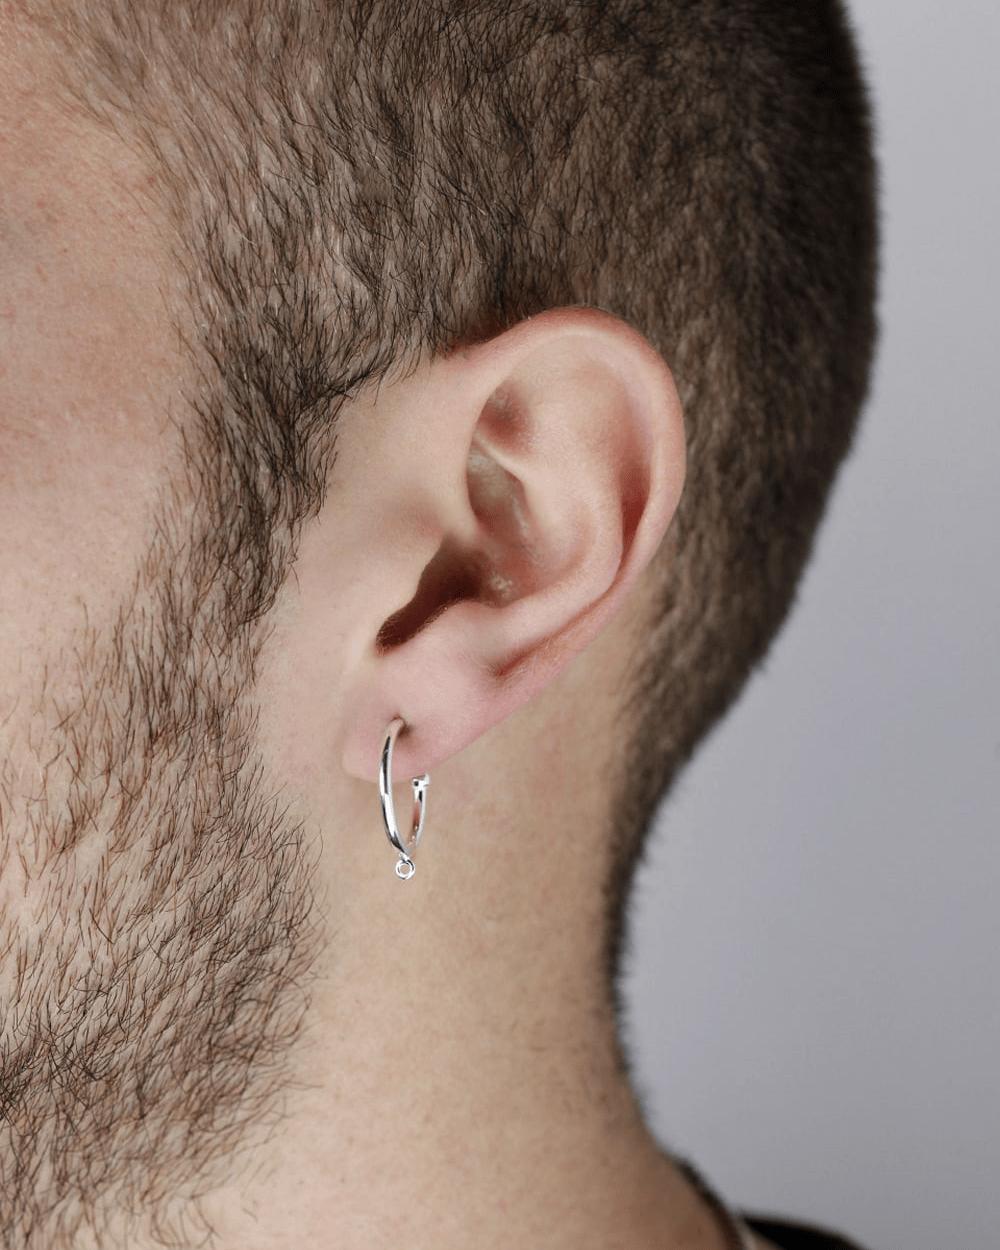 Earrings SILVER PIERCING WITH CLASP SINGLE EARRING NOVE25